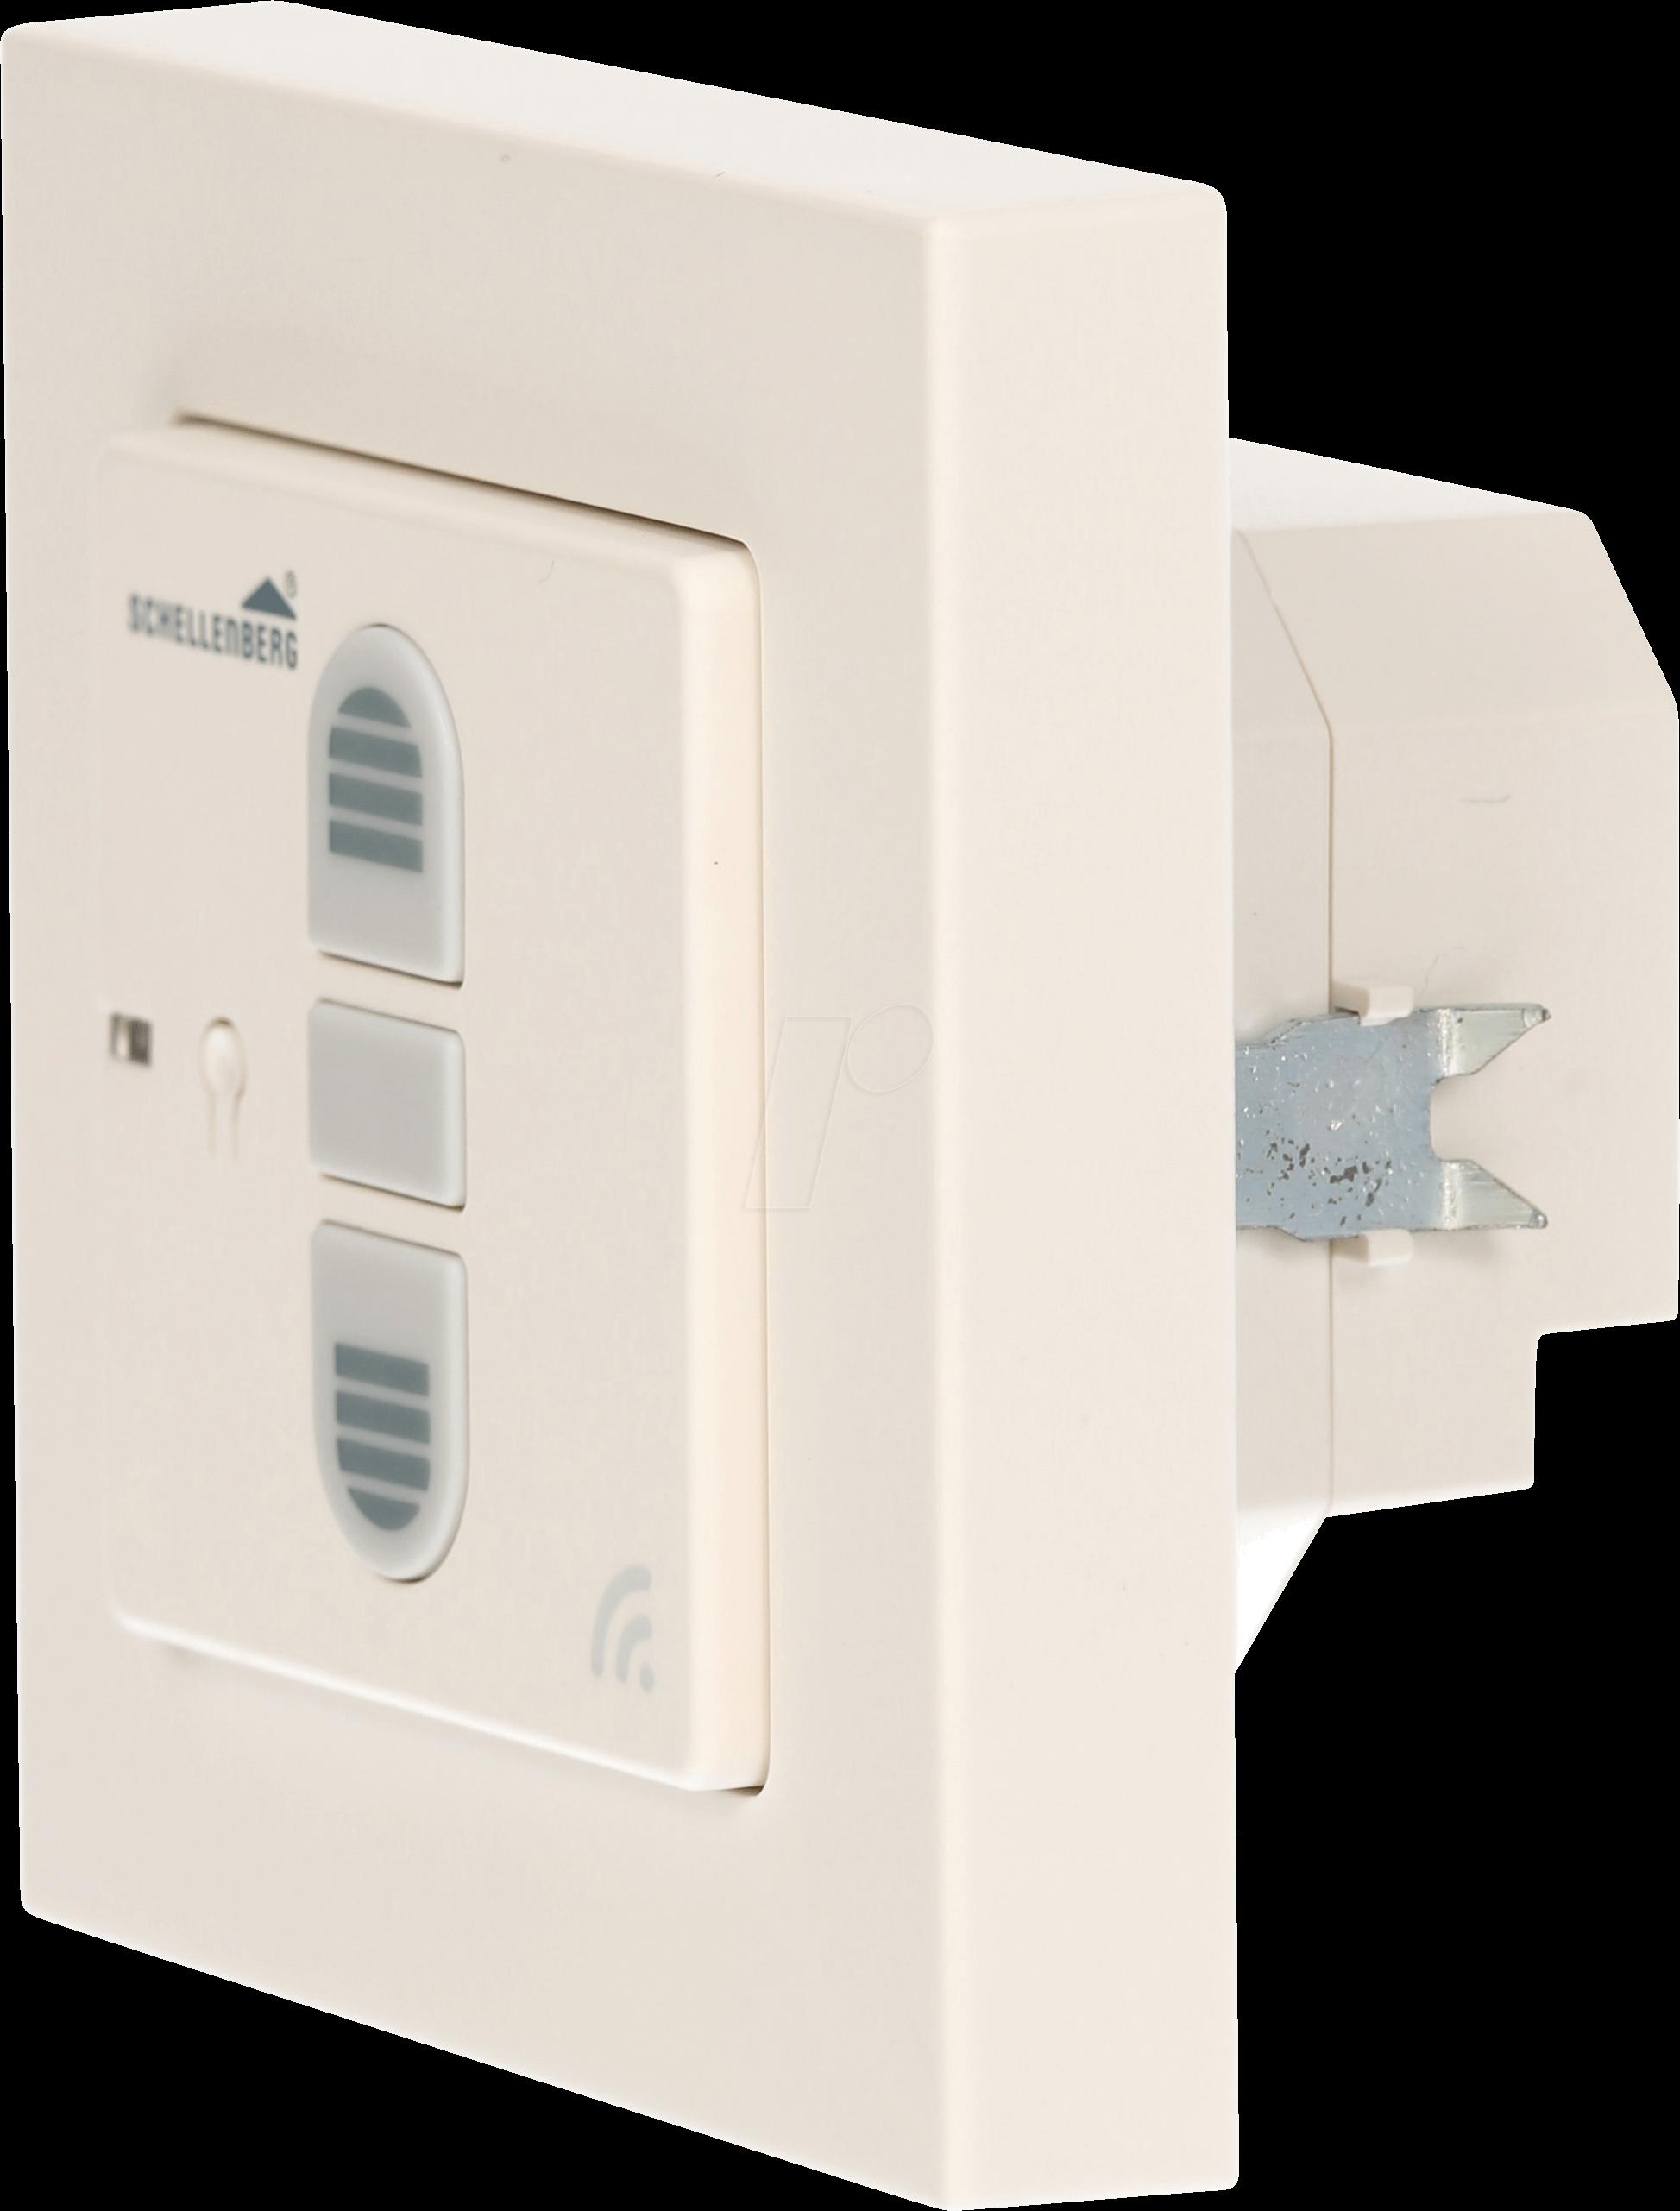 as 10525 empfangsschalter smart home bei reichelt elektronik. Black Bedroom Furniture Sets. Home Design Ideas